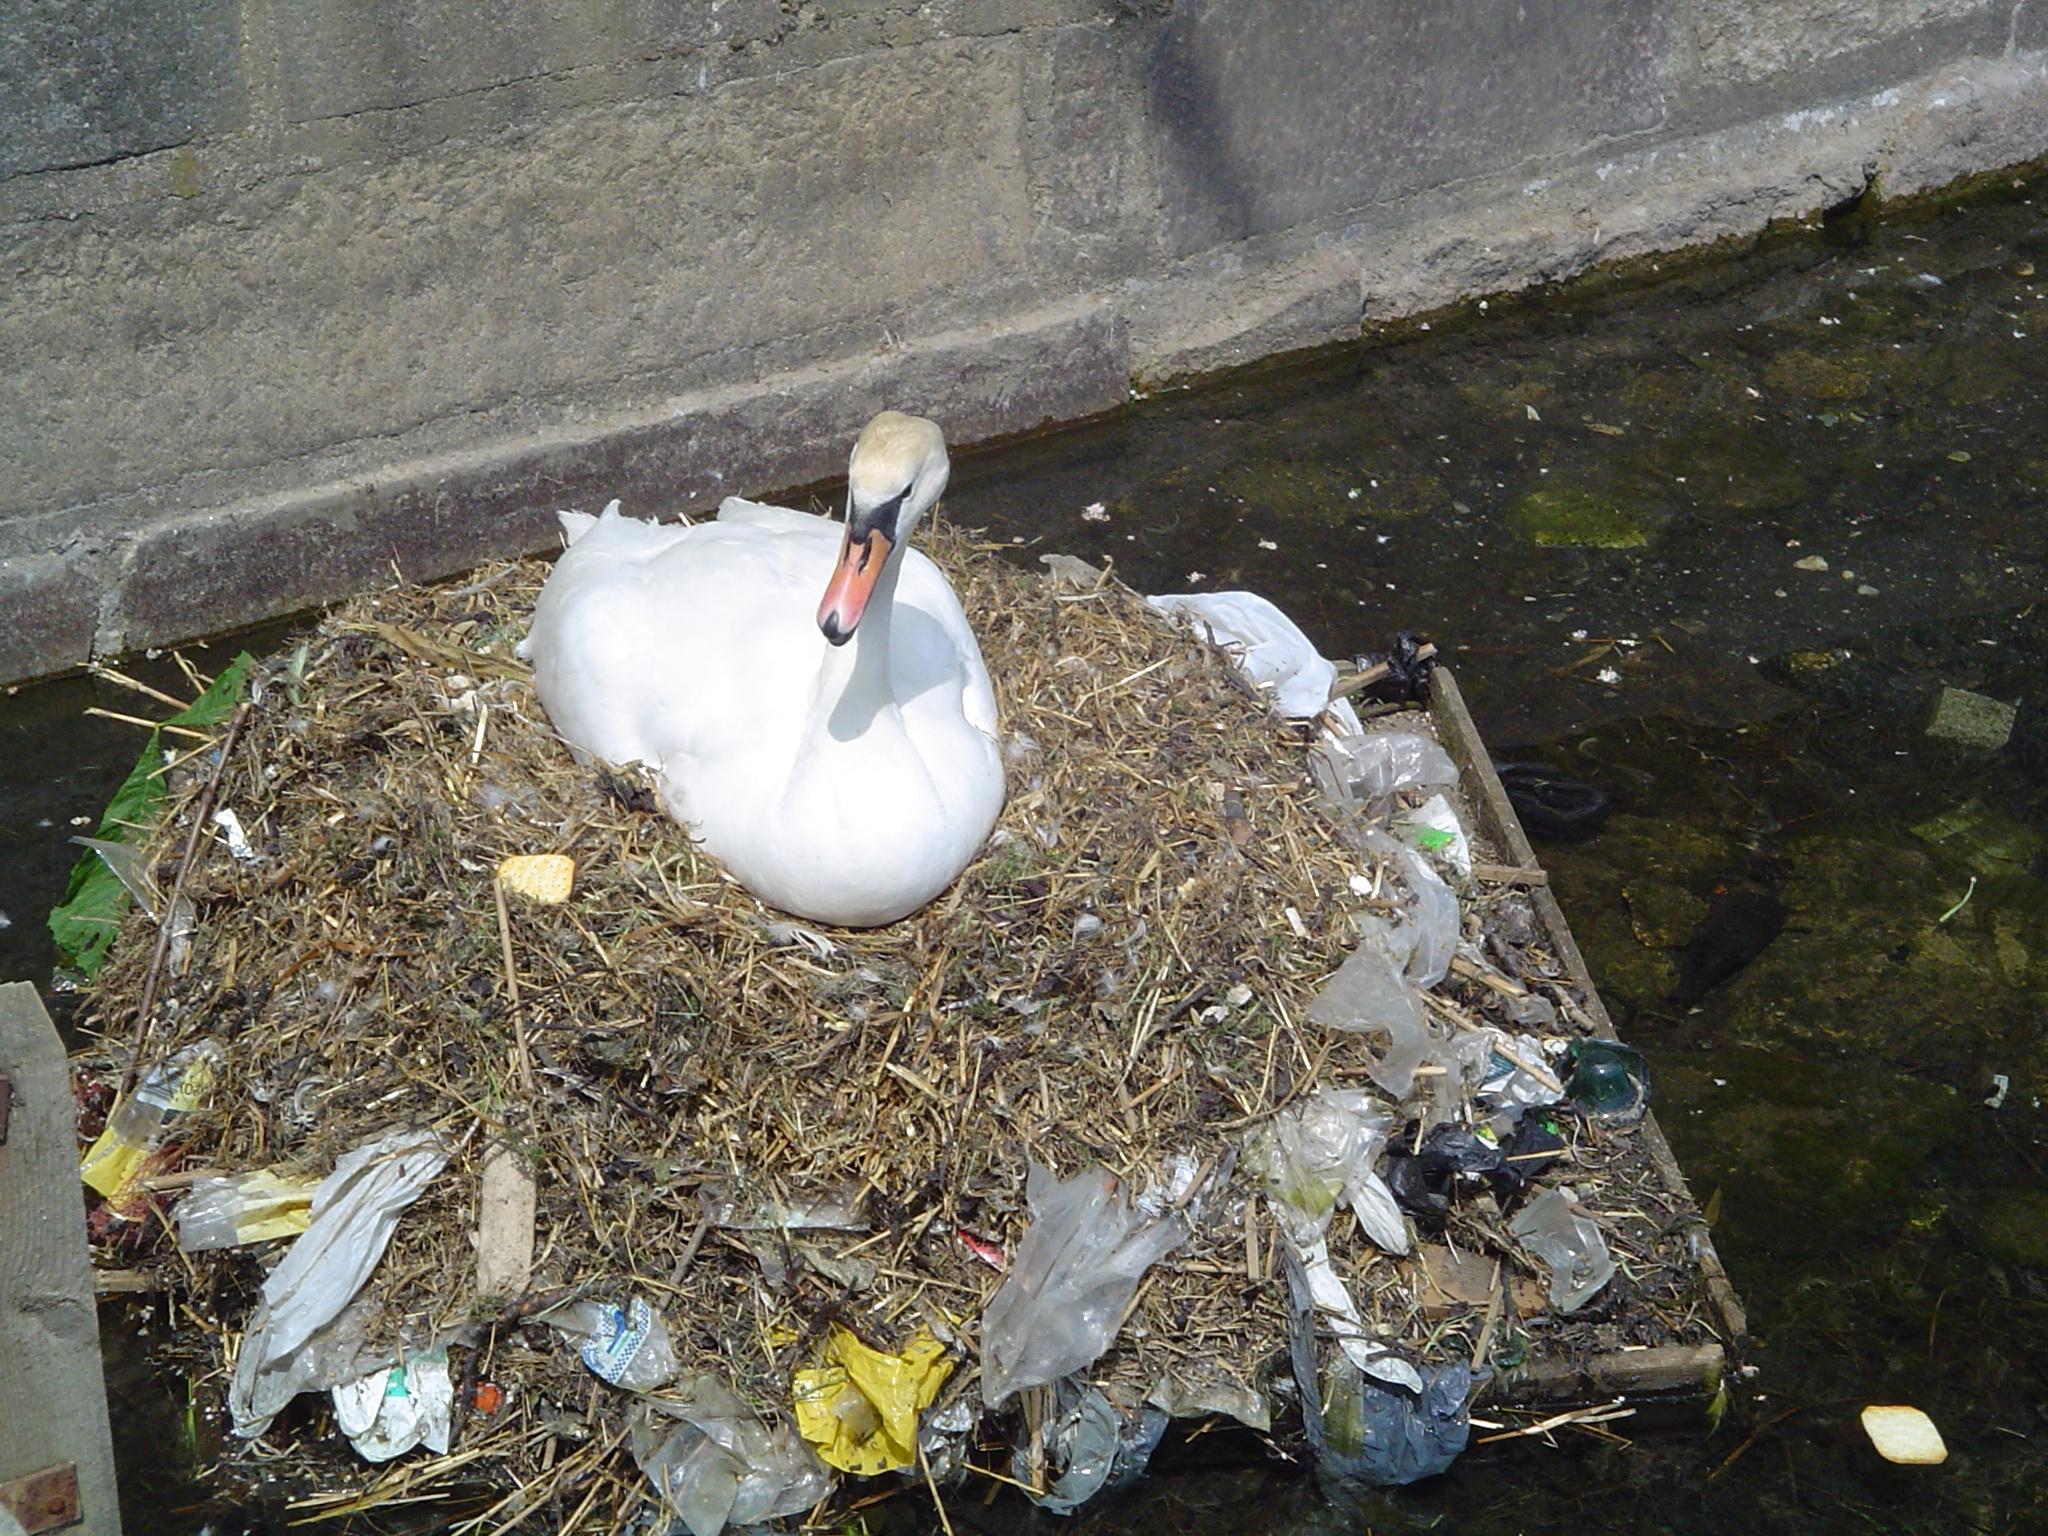 A swan nesting on plastic garbage